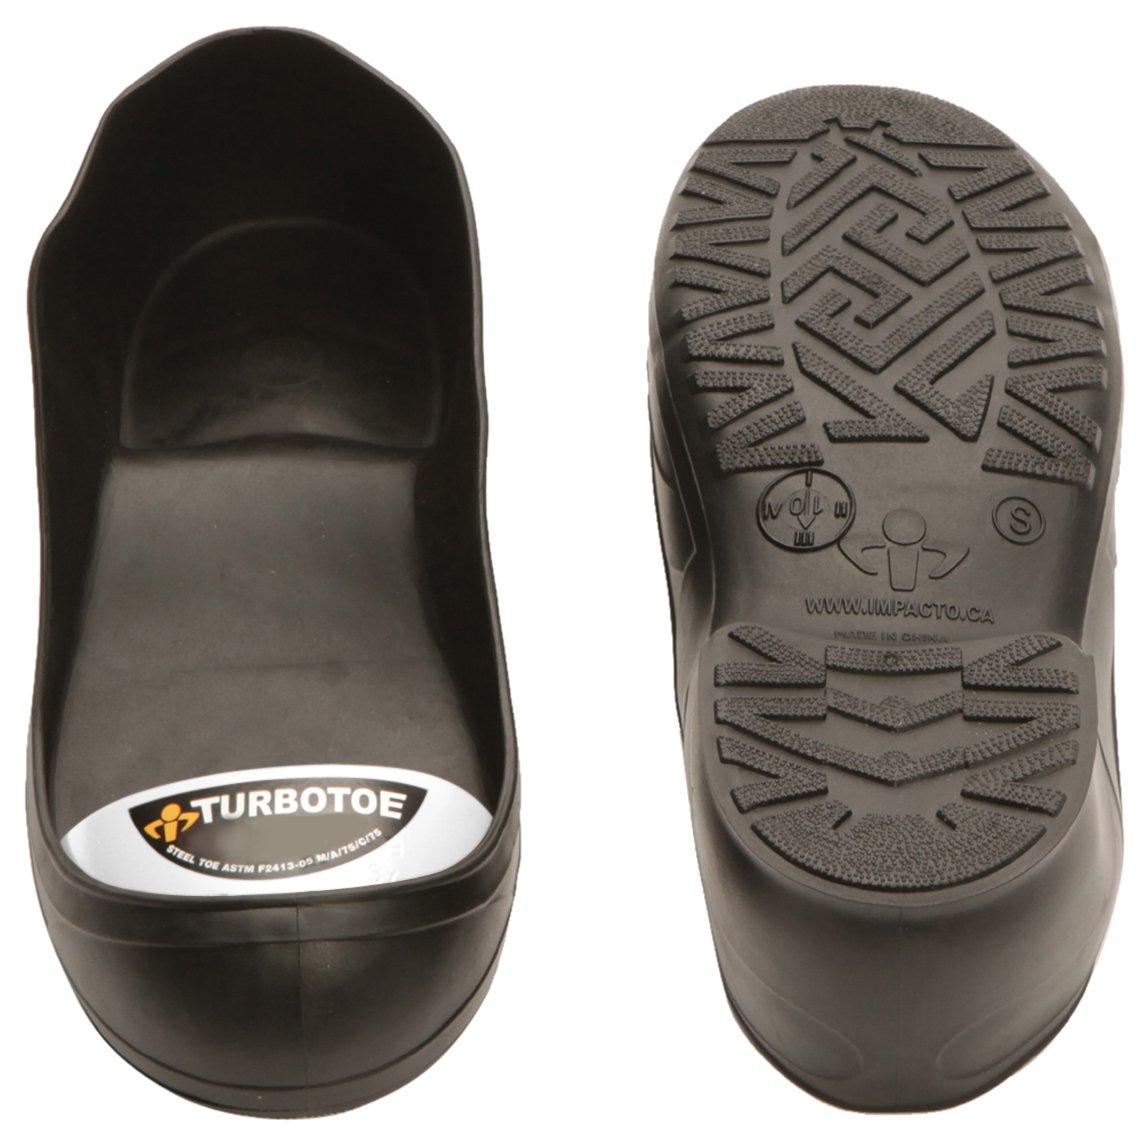 Impacto TTUS Turbotoe Steel Toe Cap, Black by Impacto (Image #1)